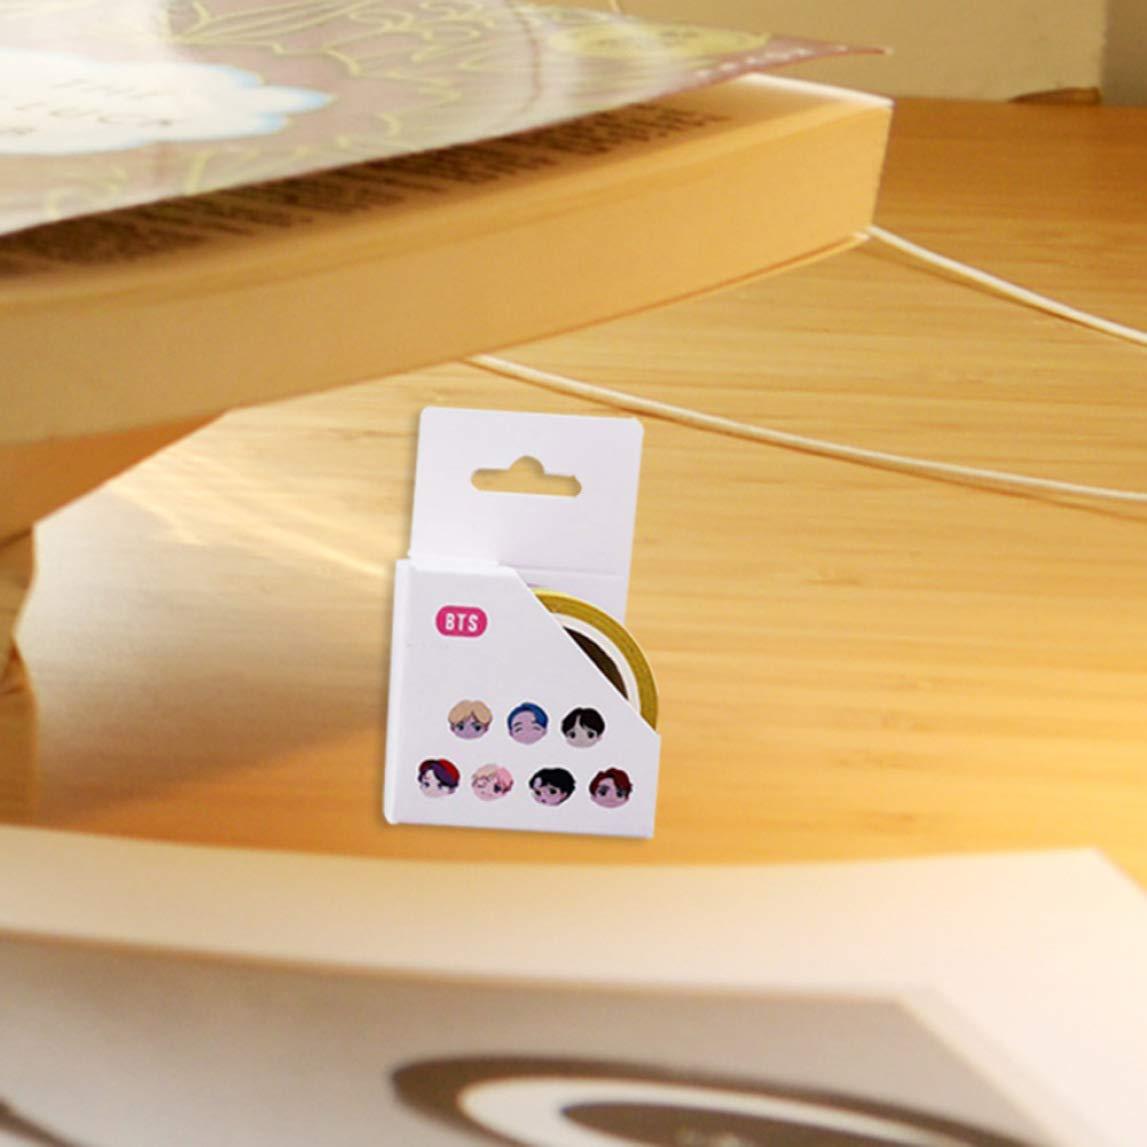 ShixinC Motivo: Cartoni Animati KPOP BTS A Nastro Adesivo in Carta Washi Multicolore 5 m